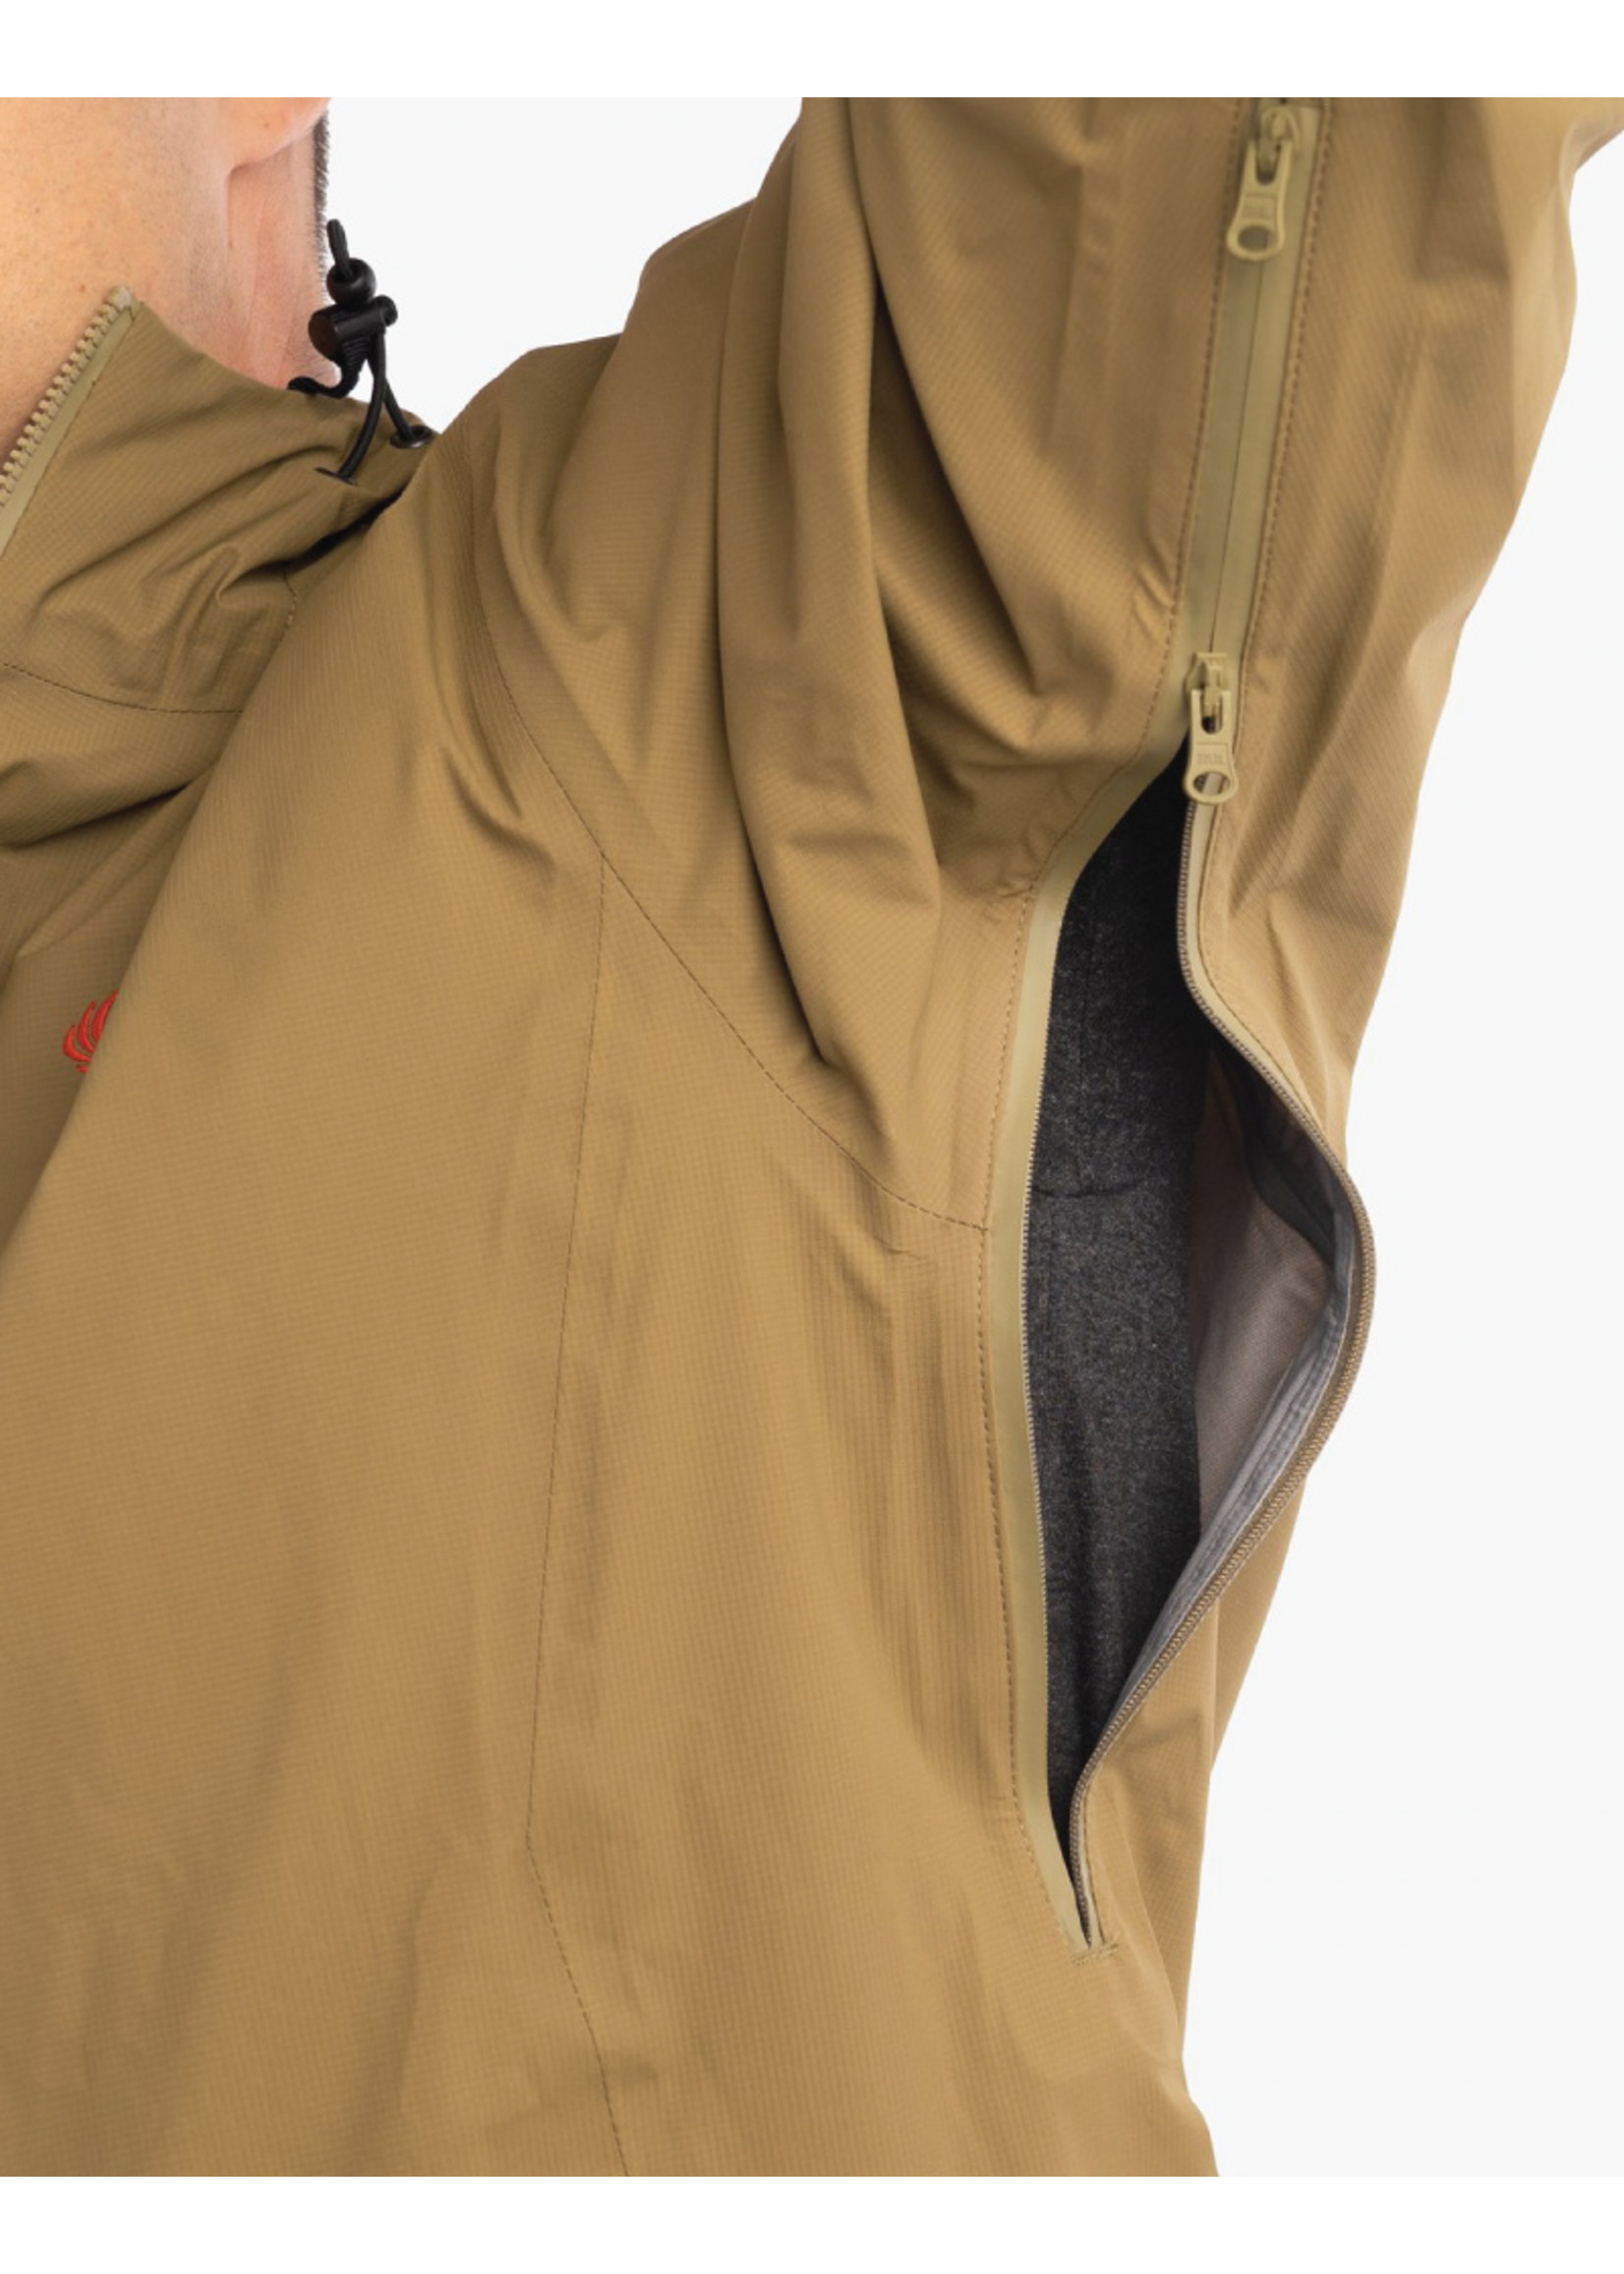 Duck Camp Duck Camp 3L Ultralight Rain Jacket